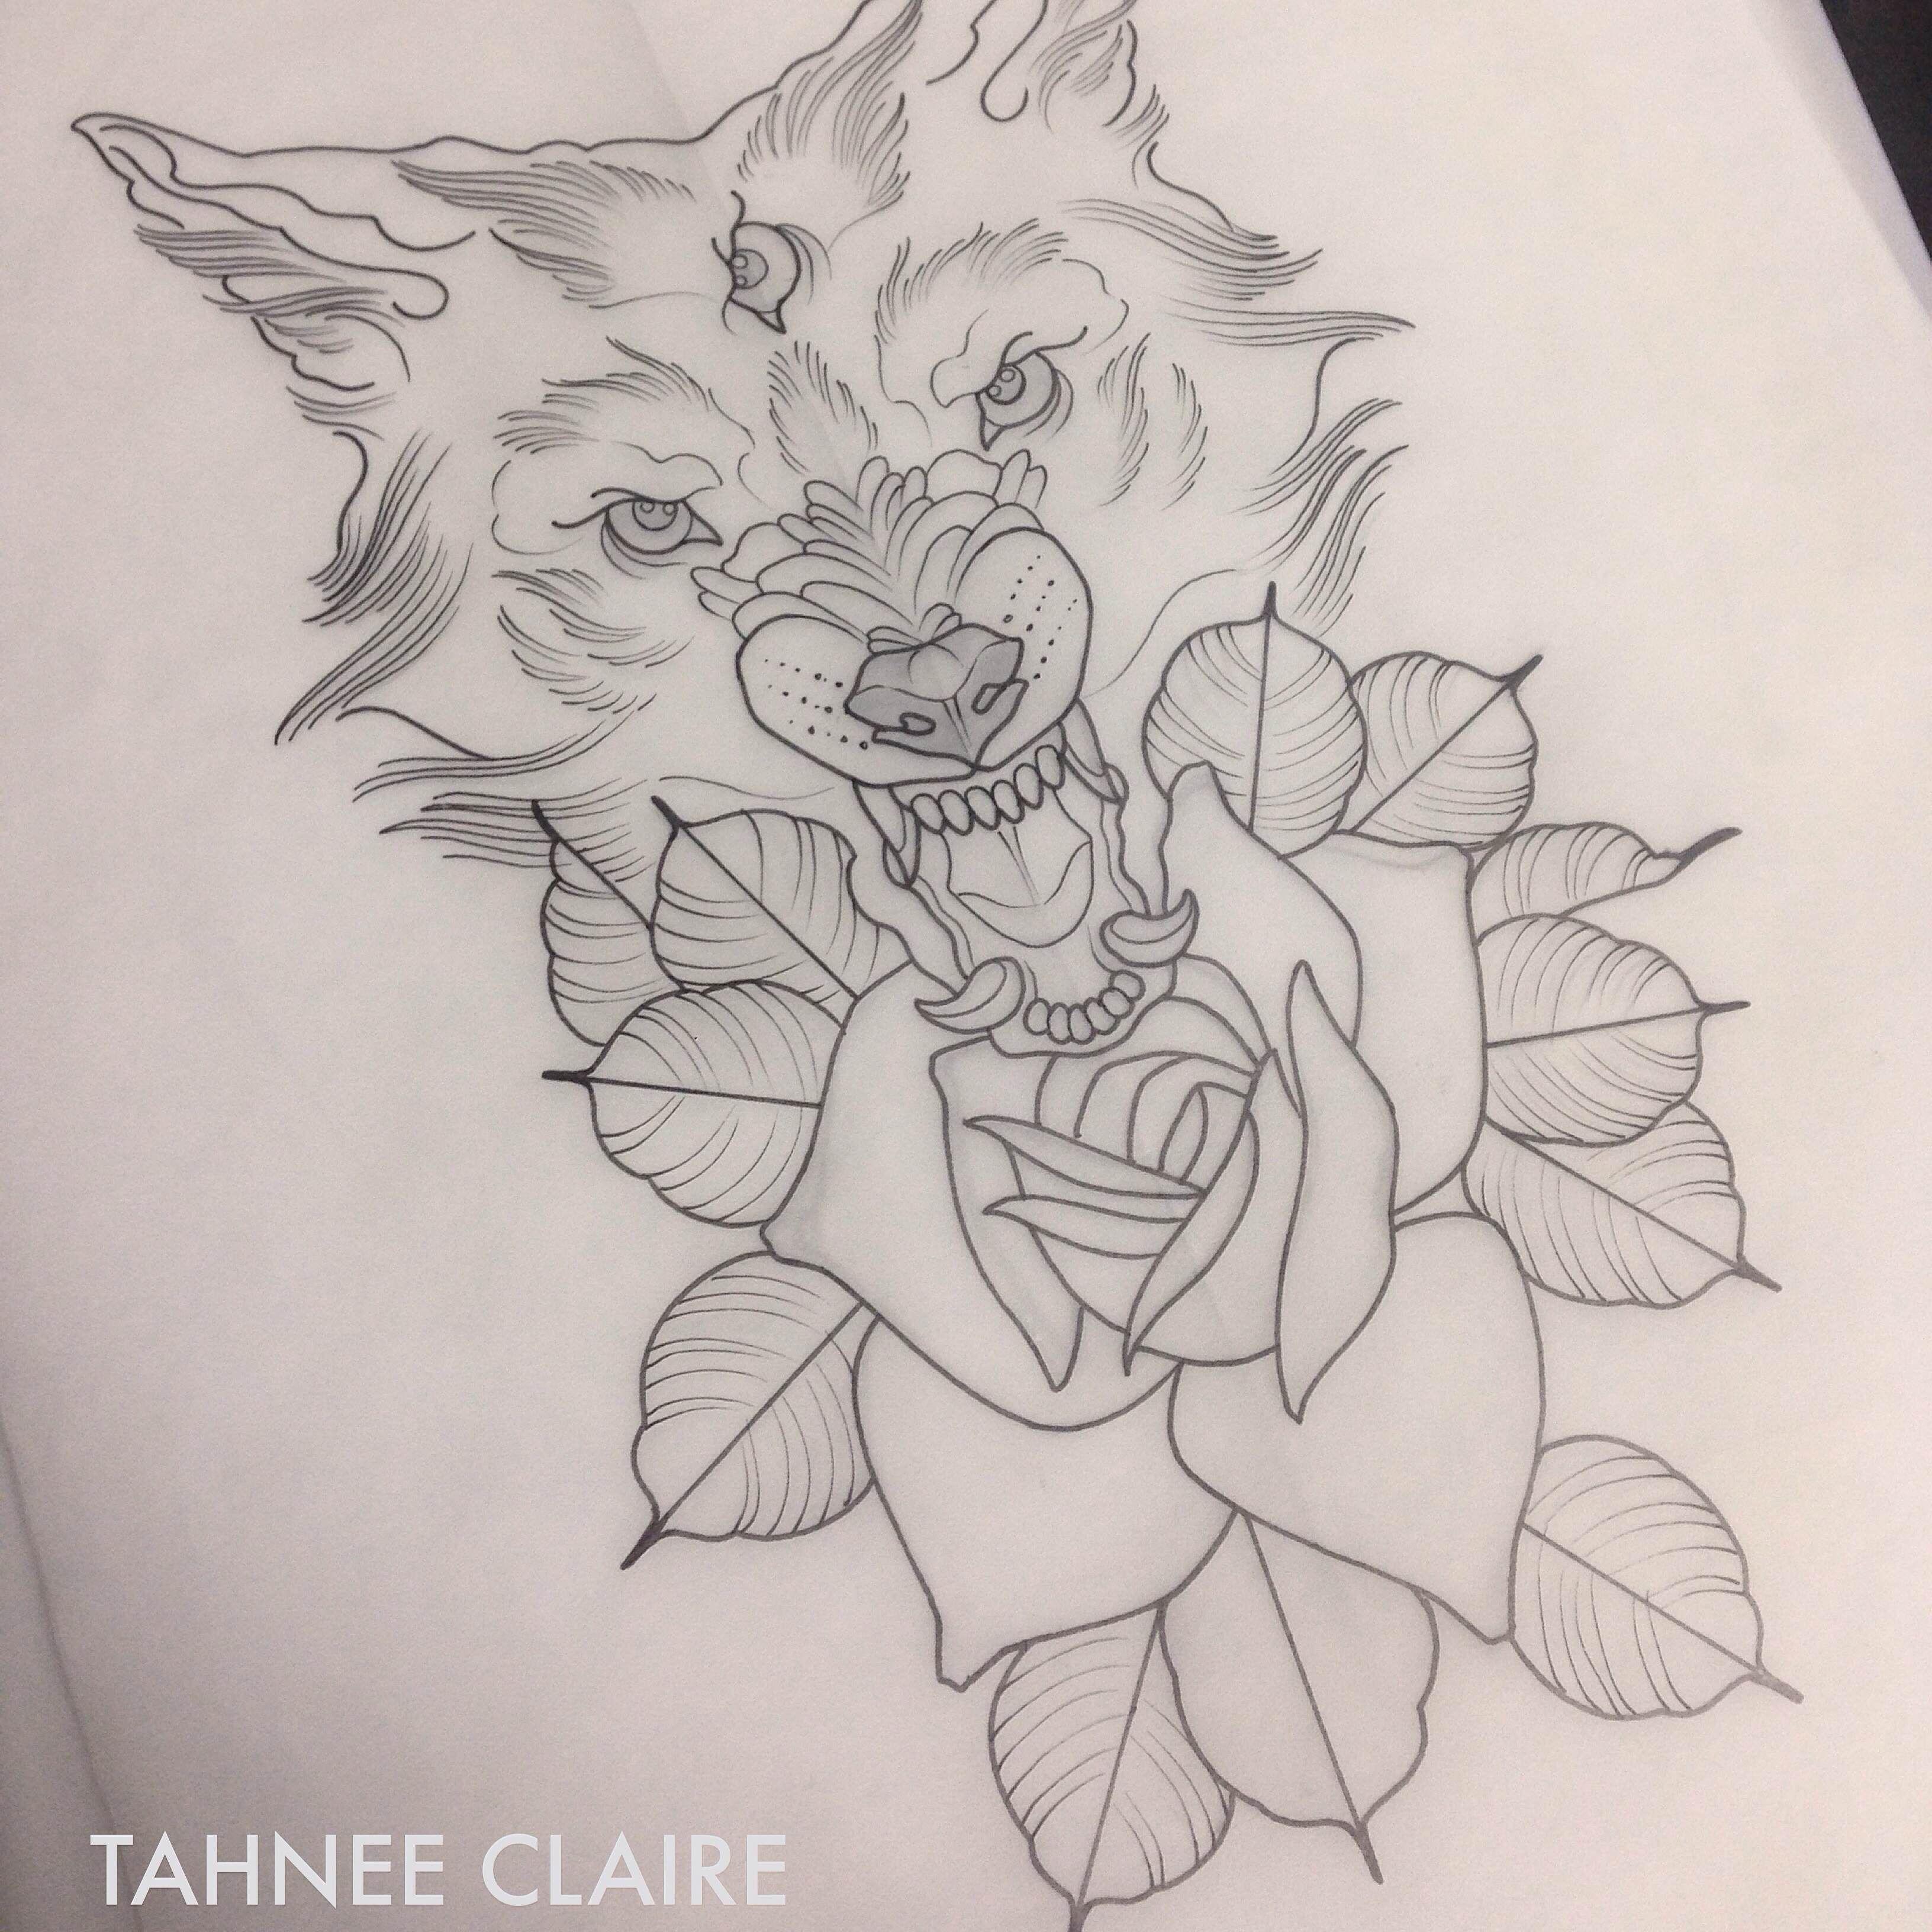 Pin By Luiz Ramaciotti On Diseno Wolf Tattoos Tattoo Design Drawings Animal Tattoos